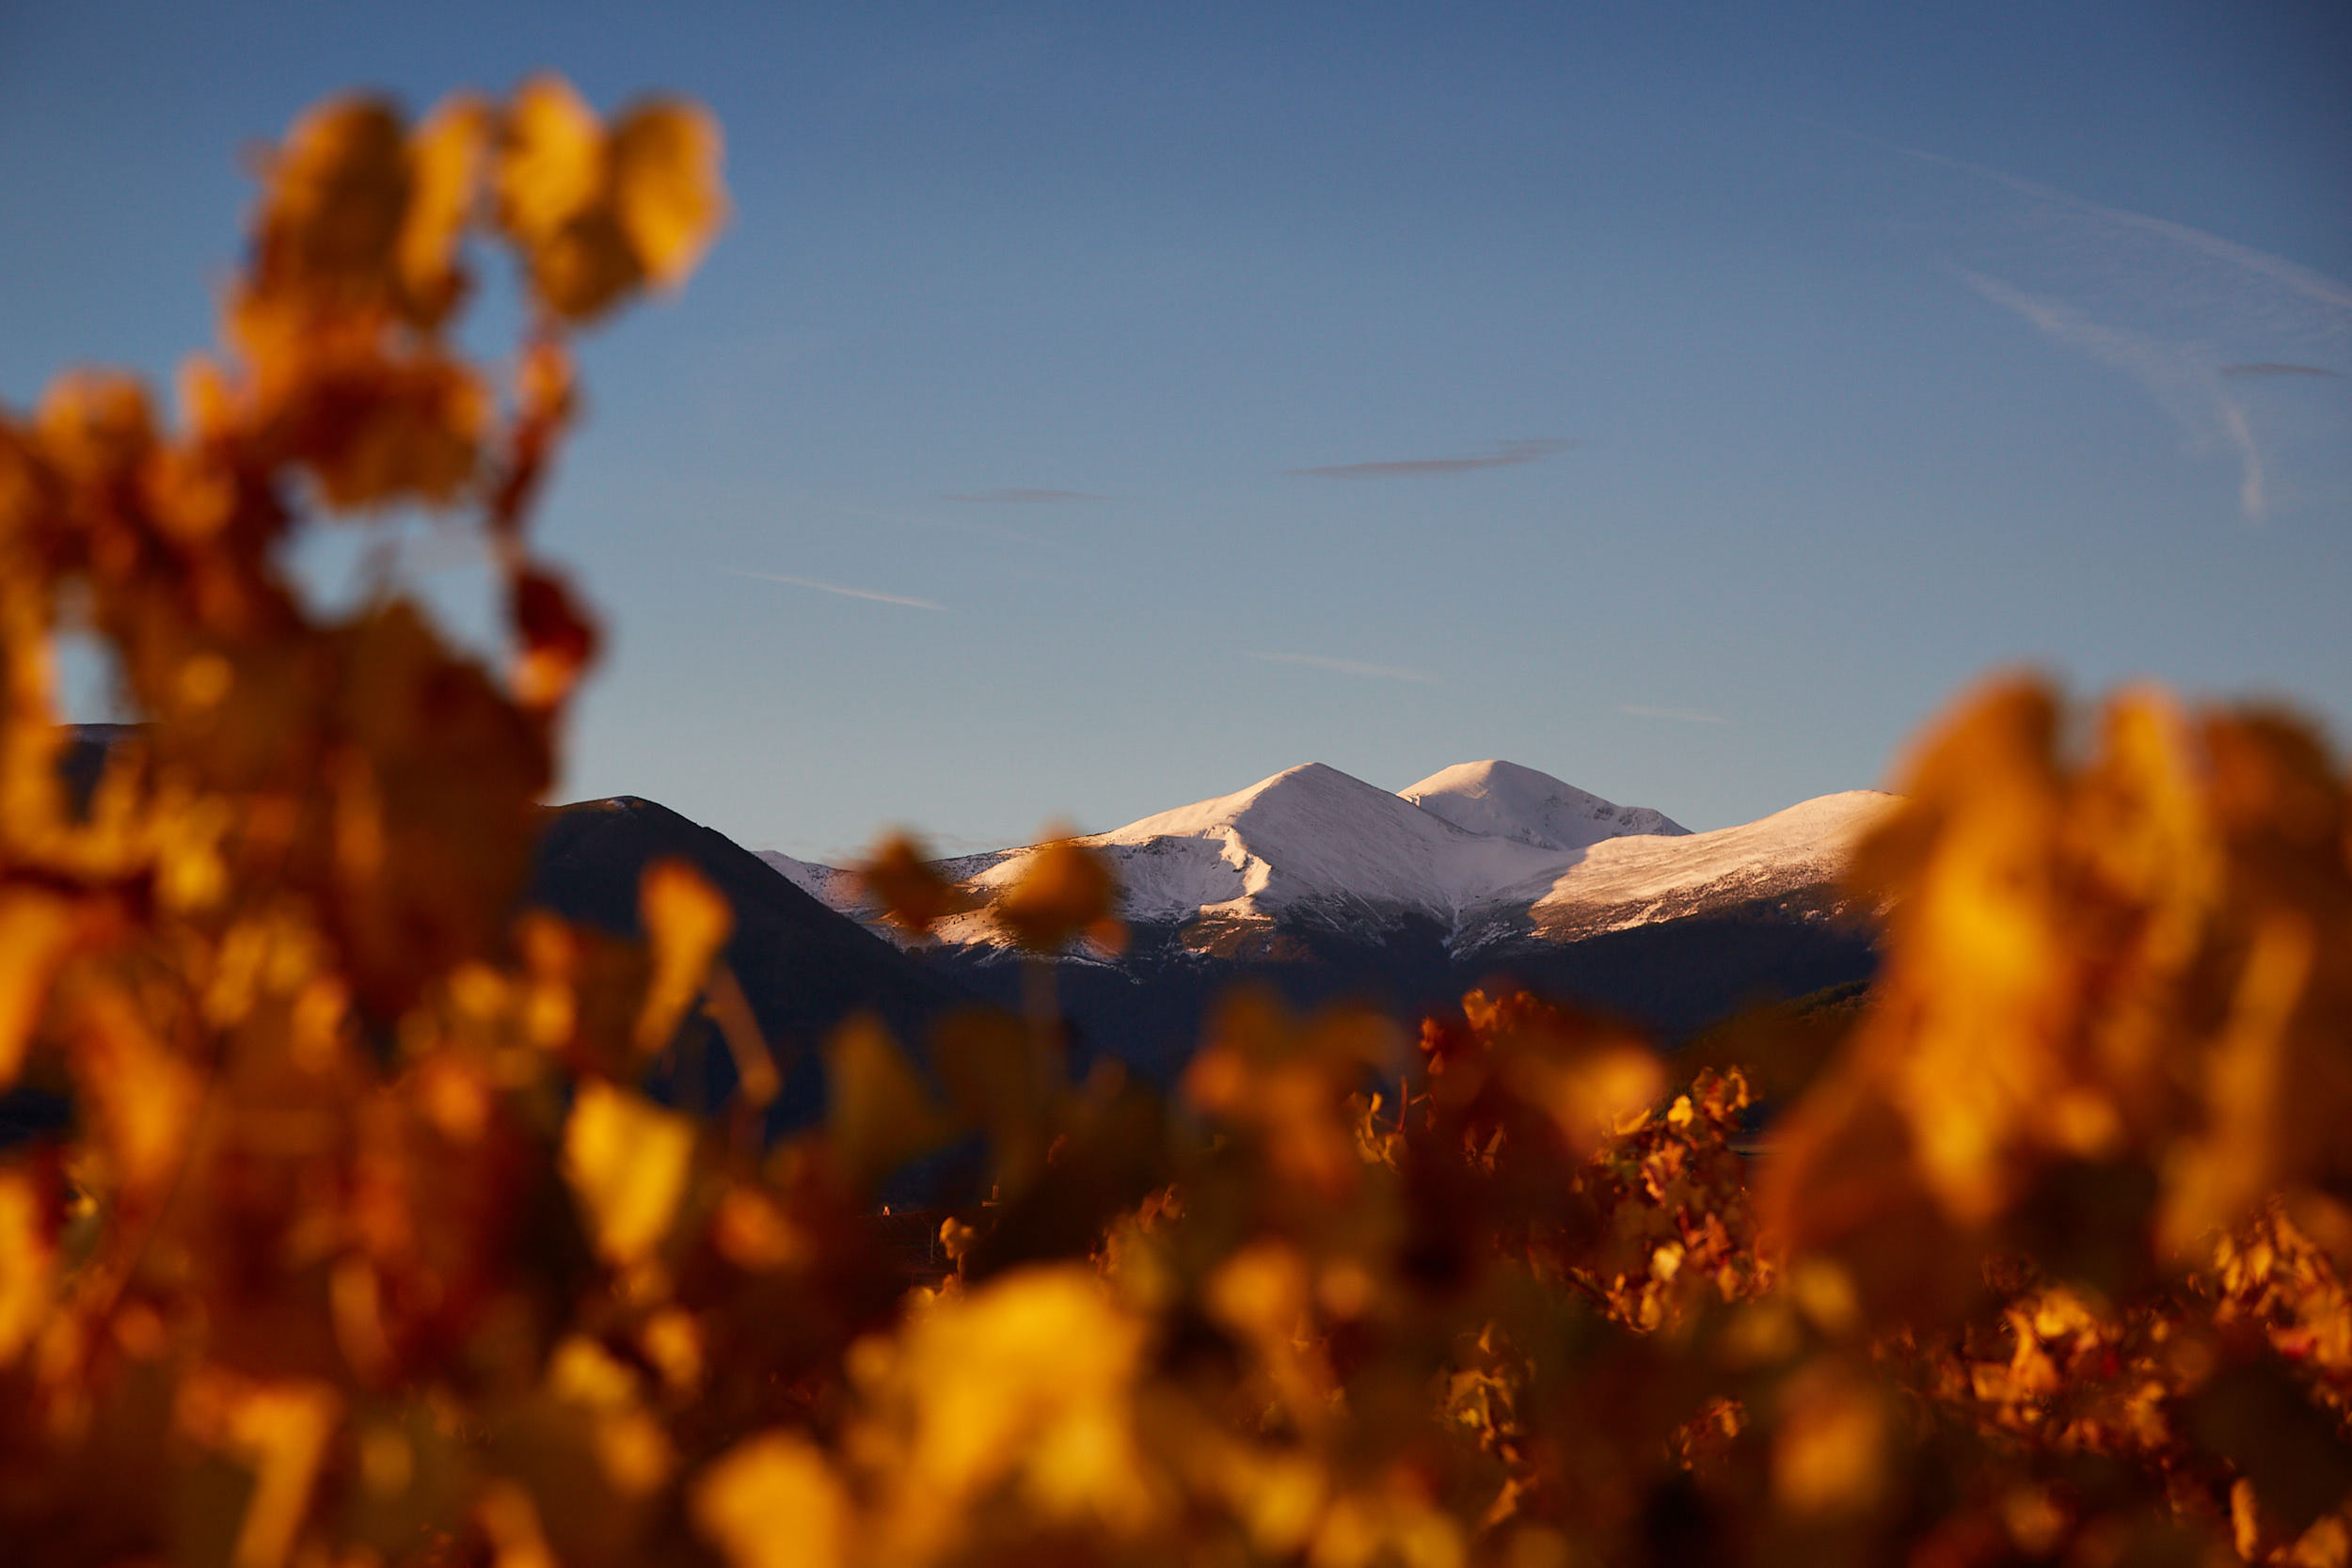 1811Commercial-professional-wine-photography-la-rioja-spain-James-Sturcke_0047.jpg